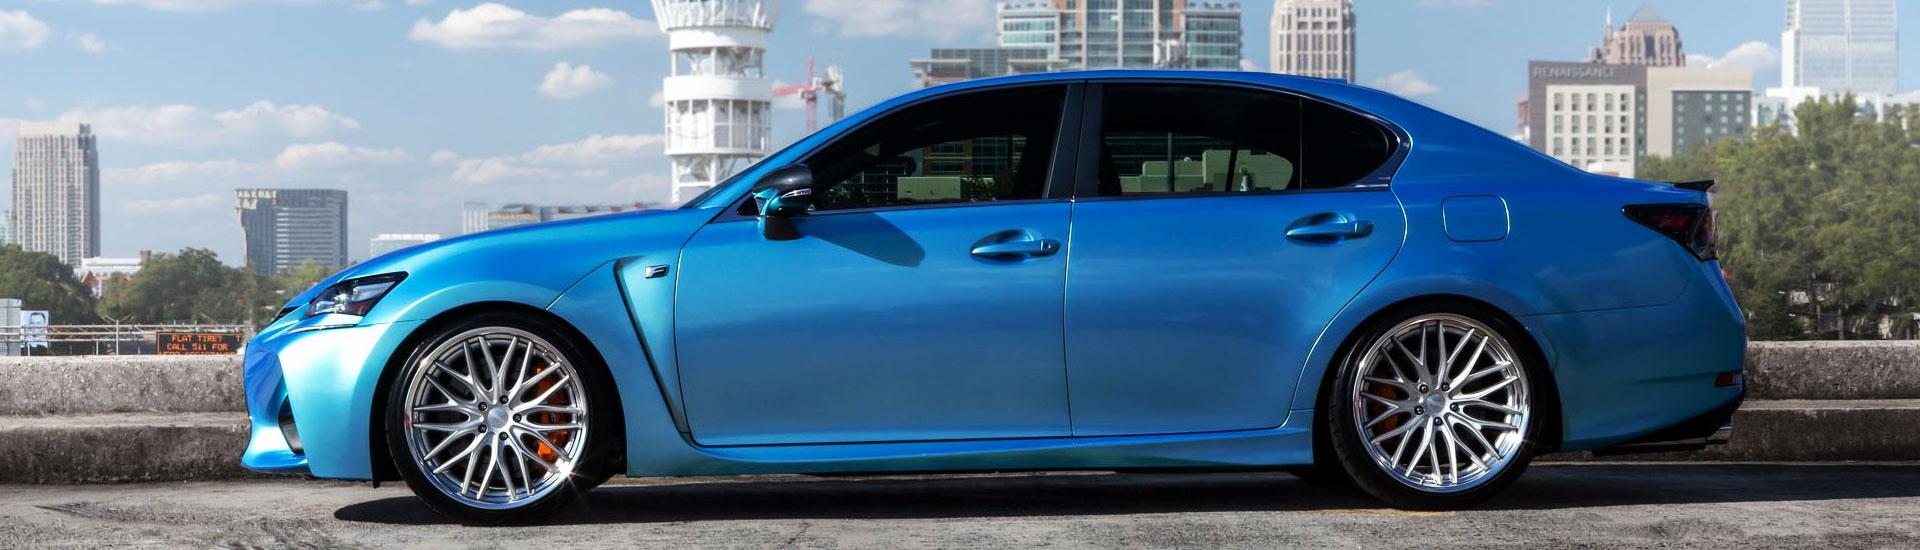 Lexus Wraps Buy For Ct Gx Ls Nx Rc Sc More 2005 330 Blue Colors 3m Series 1080 Rwraps Avery Sw 900 Oracal 970ra